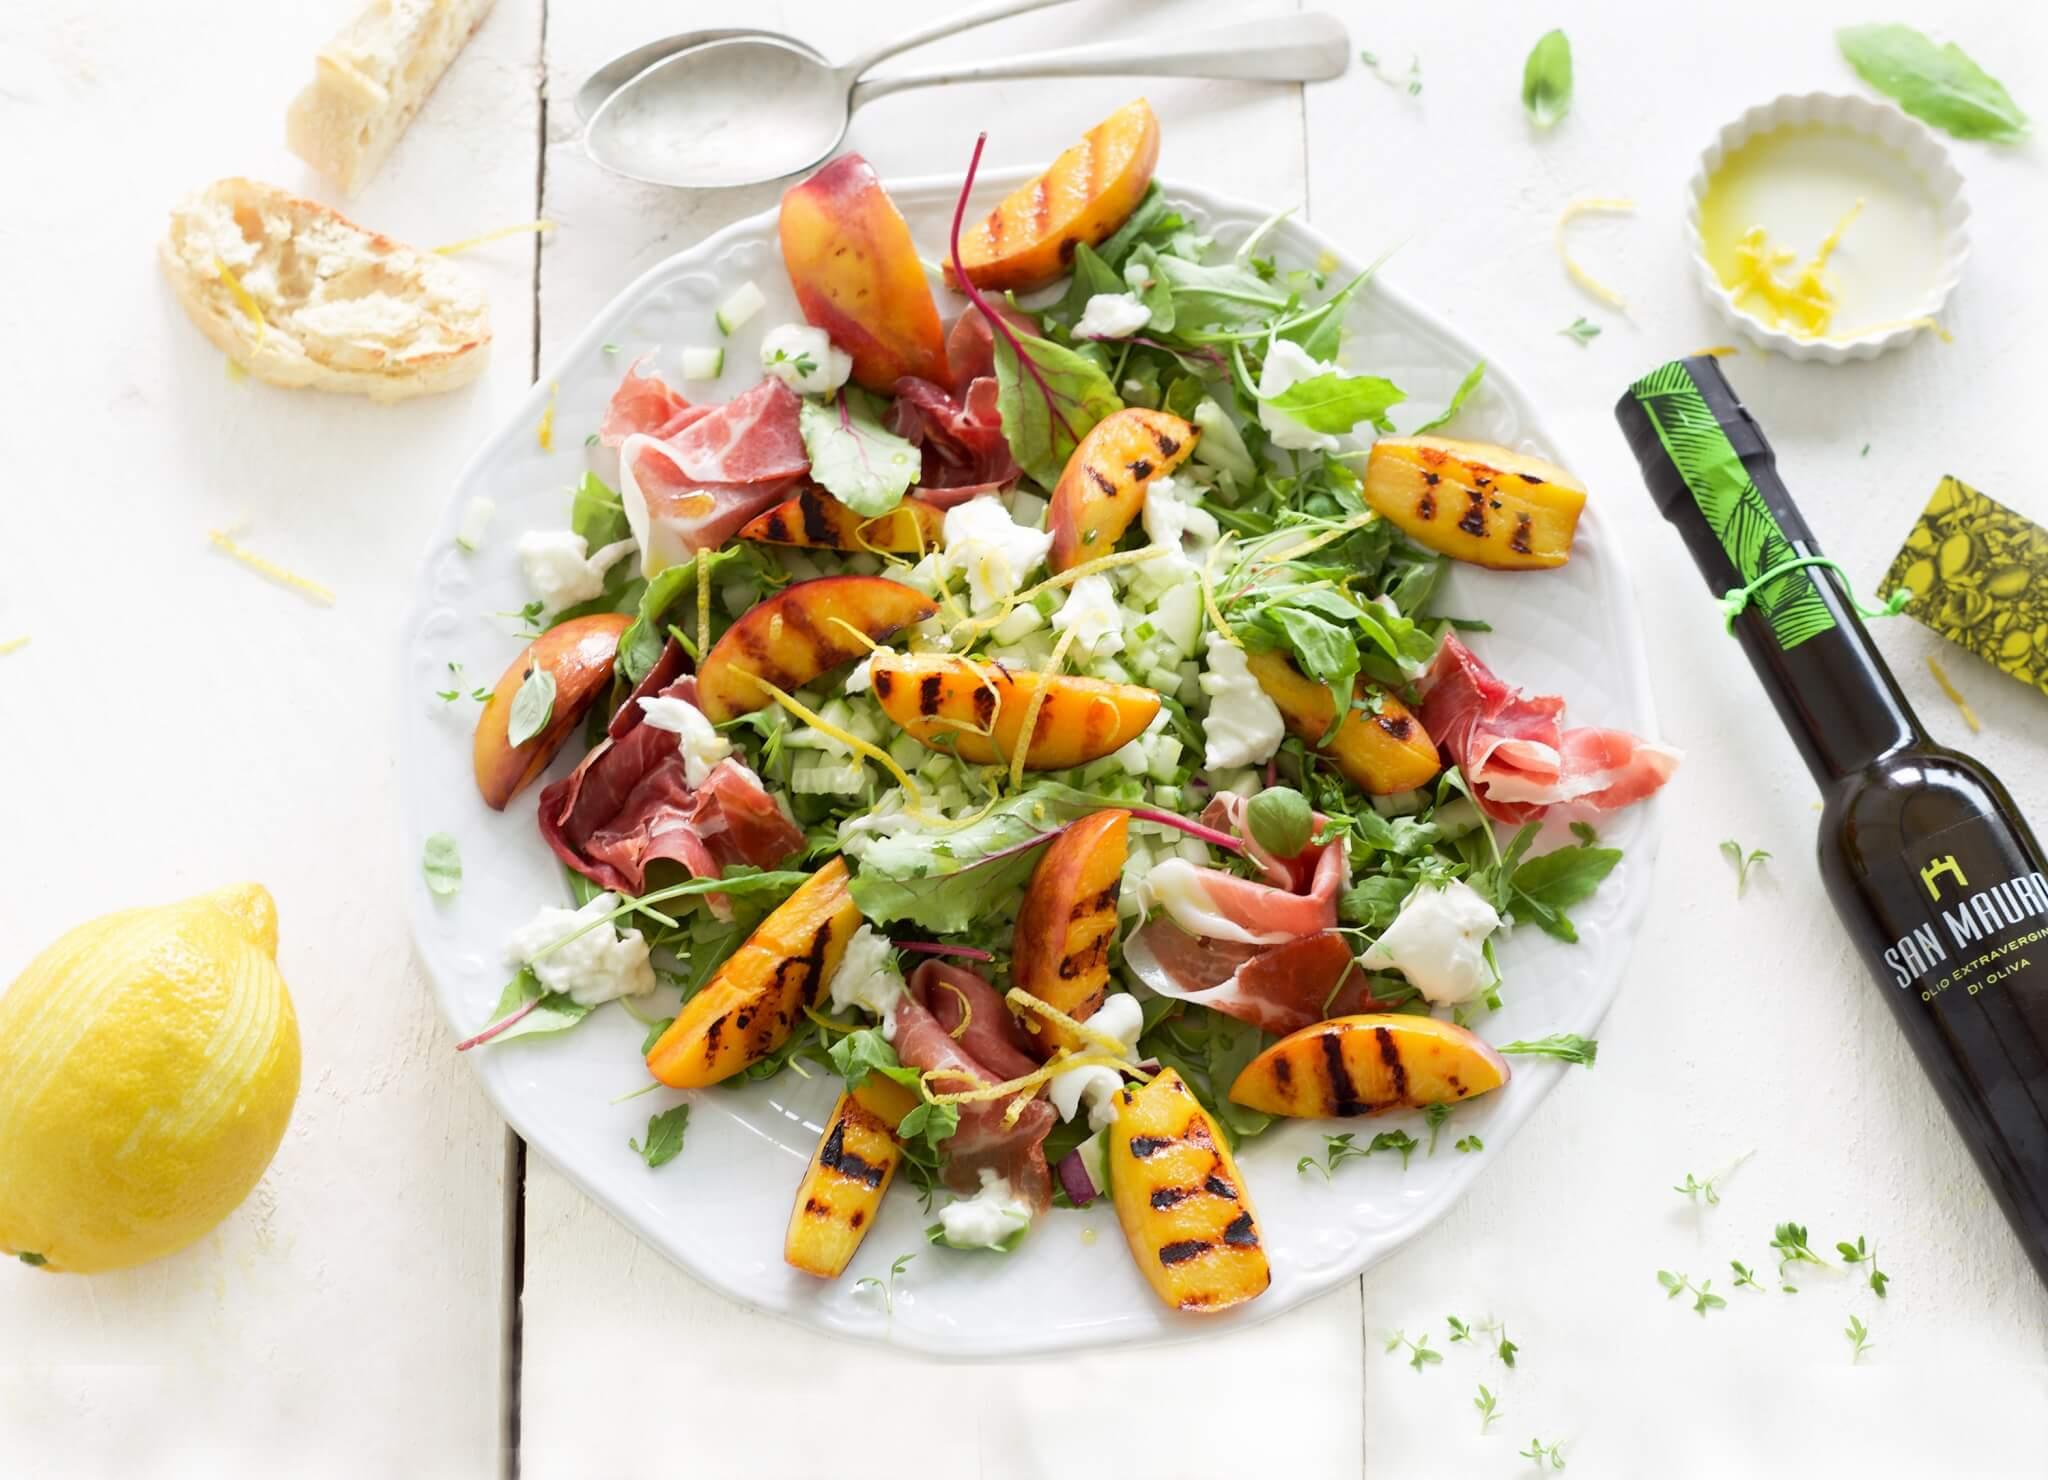 Salade met mozzarella, perzik, Parmaham en citroenolijfolie